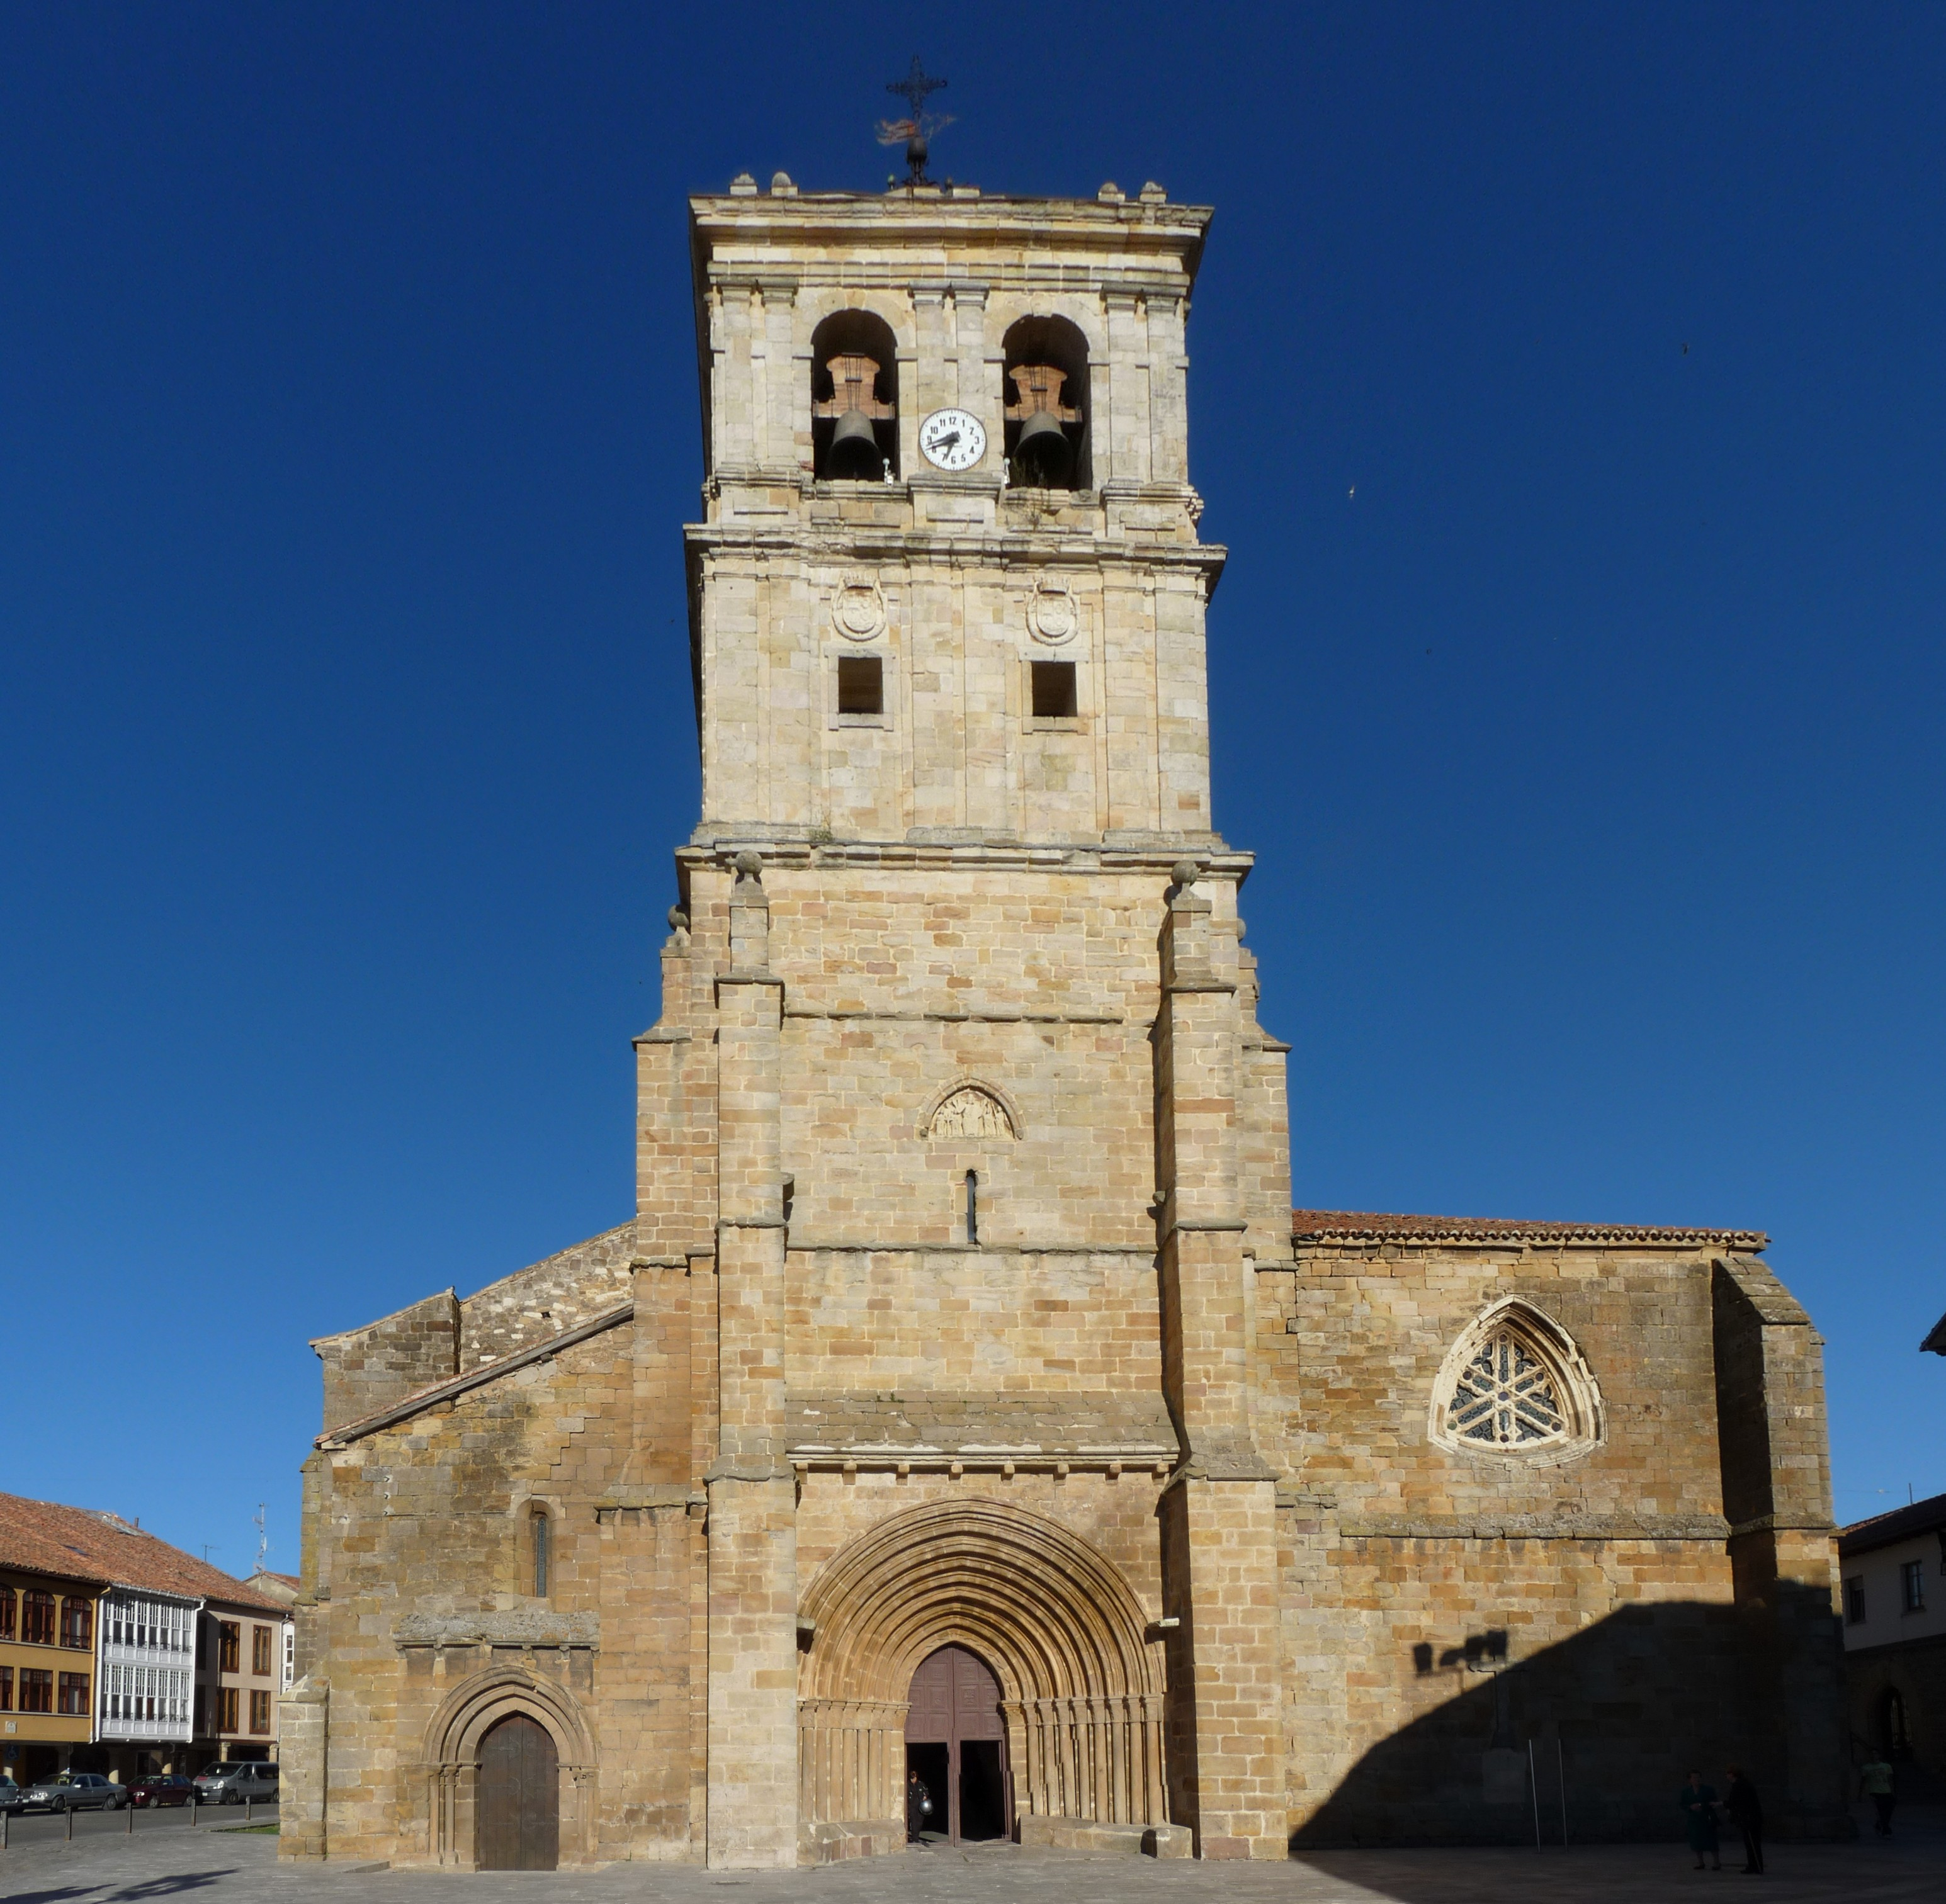 Colegiata de San Miguel de Aguilar de Campoo